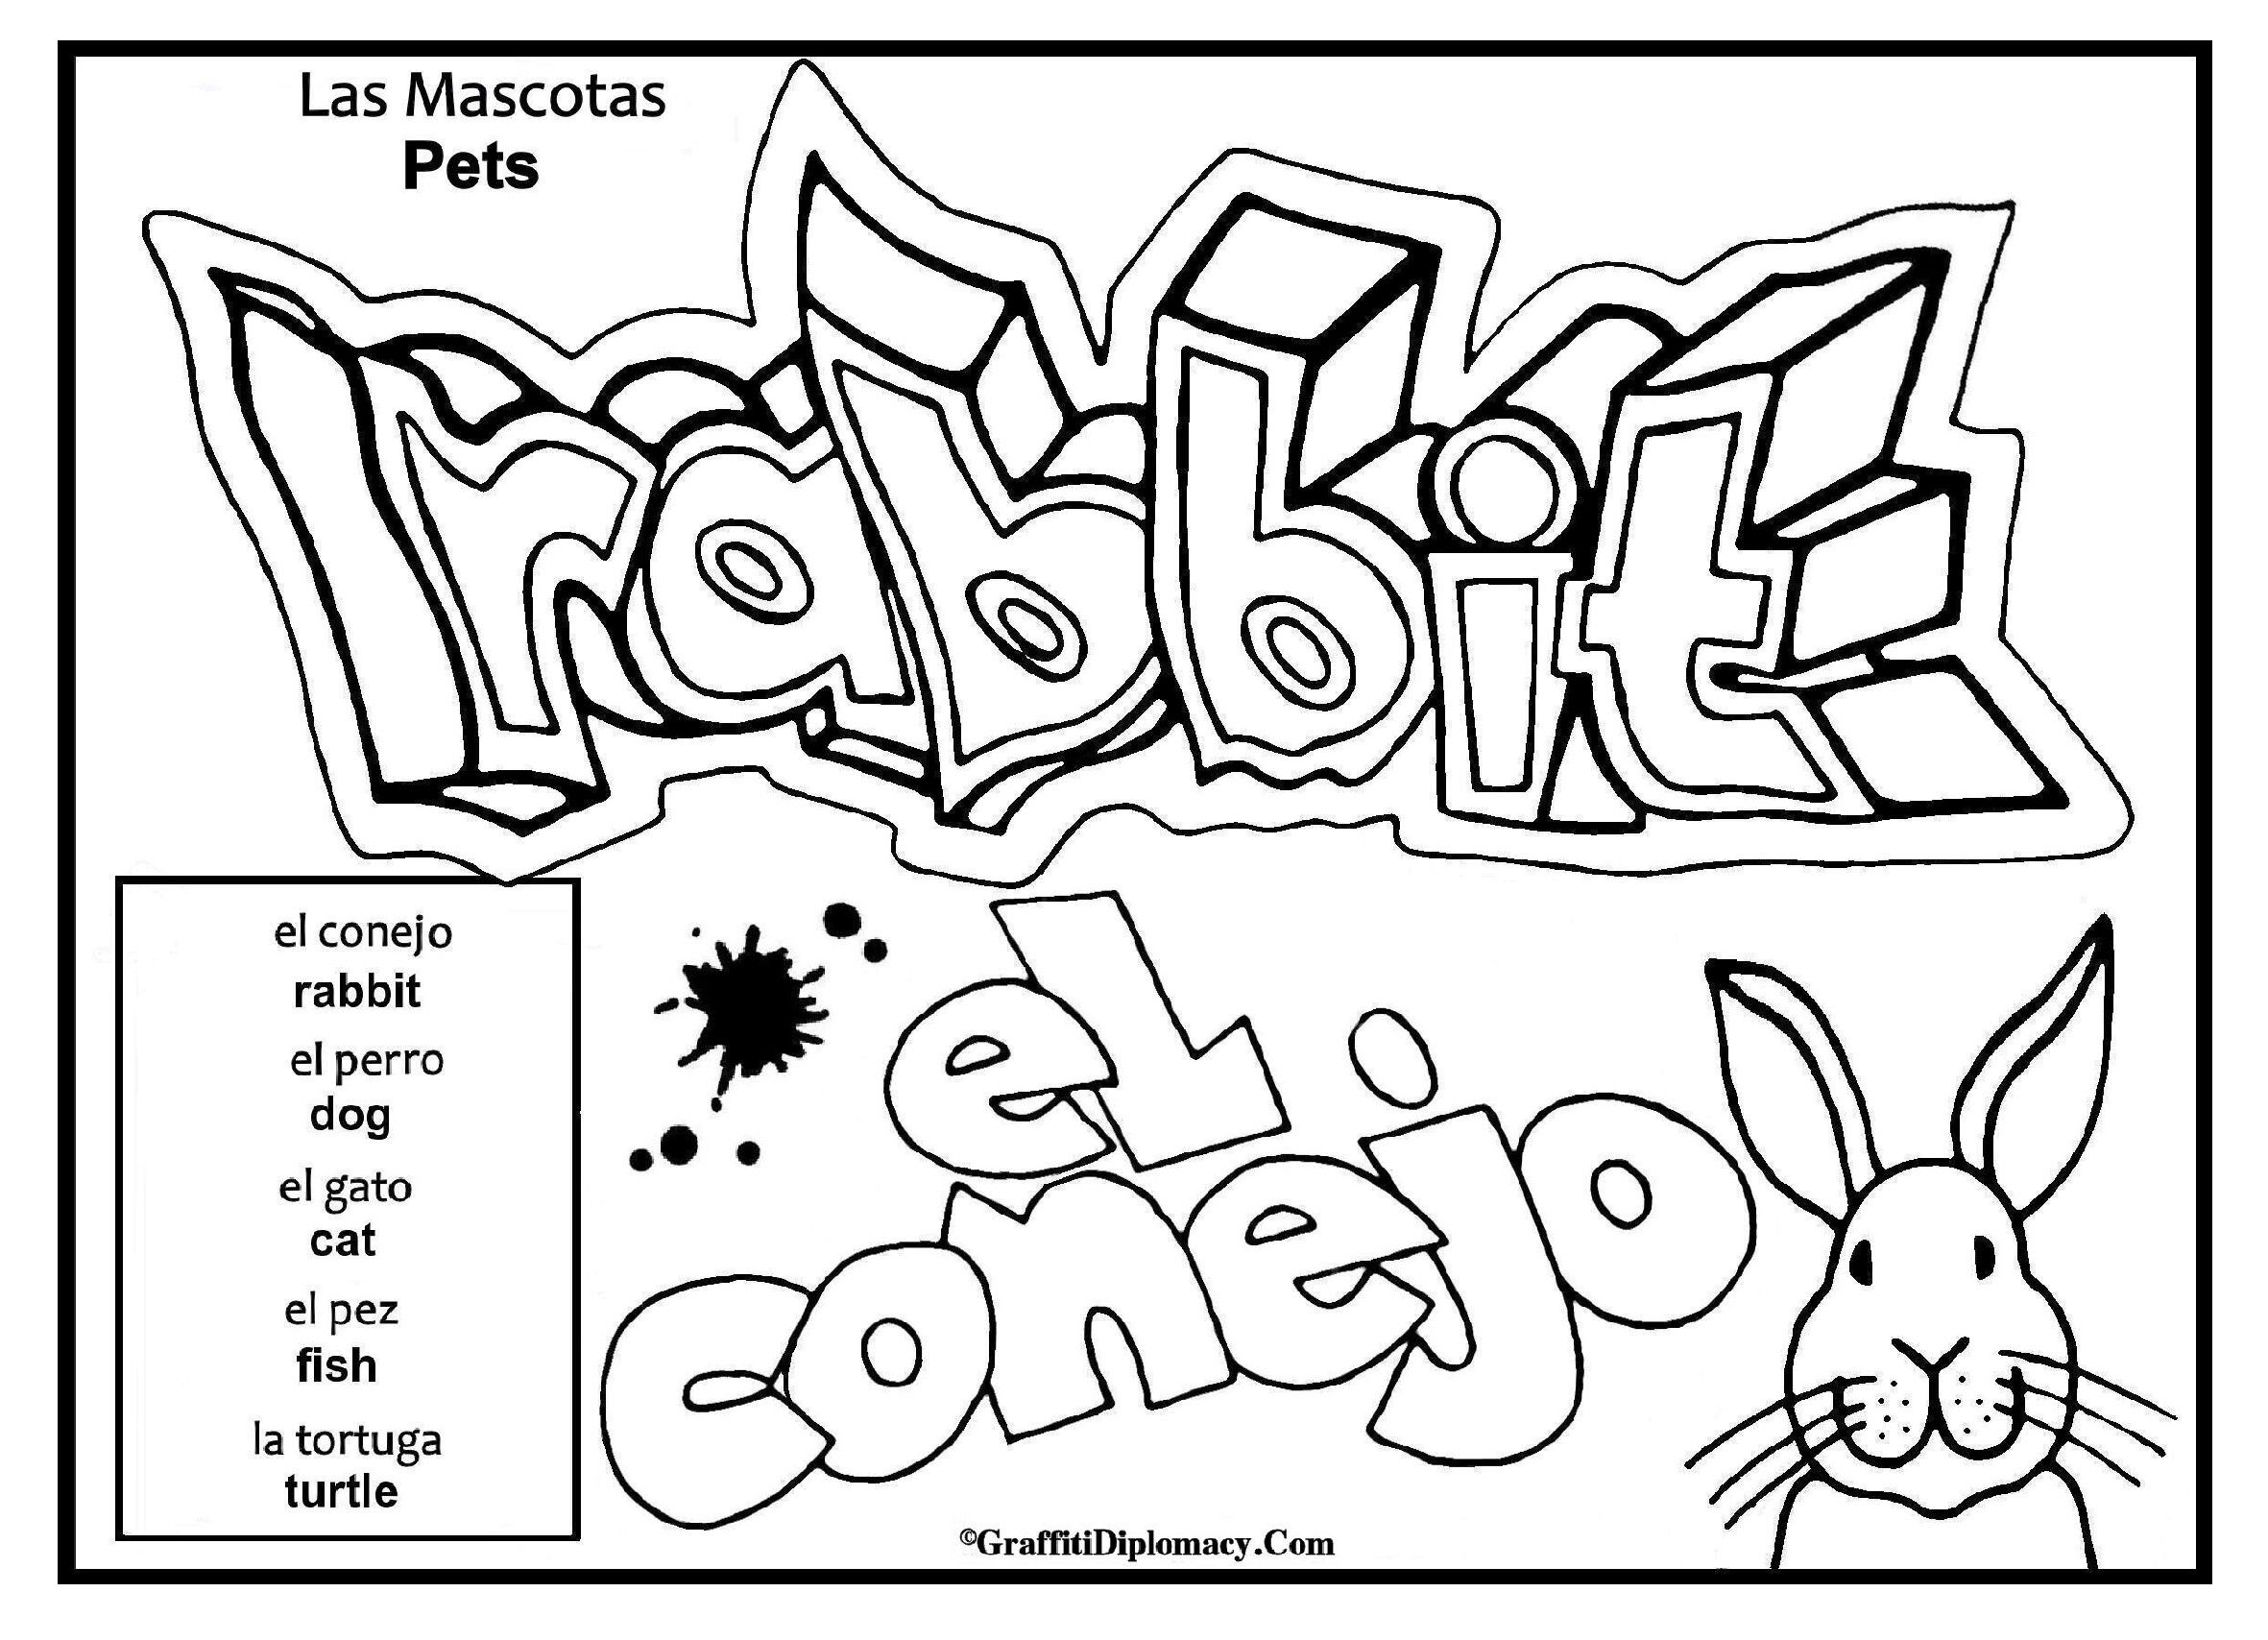 Pets - Las Mascotas , spanish to english printable graffiti coloring ...